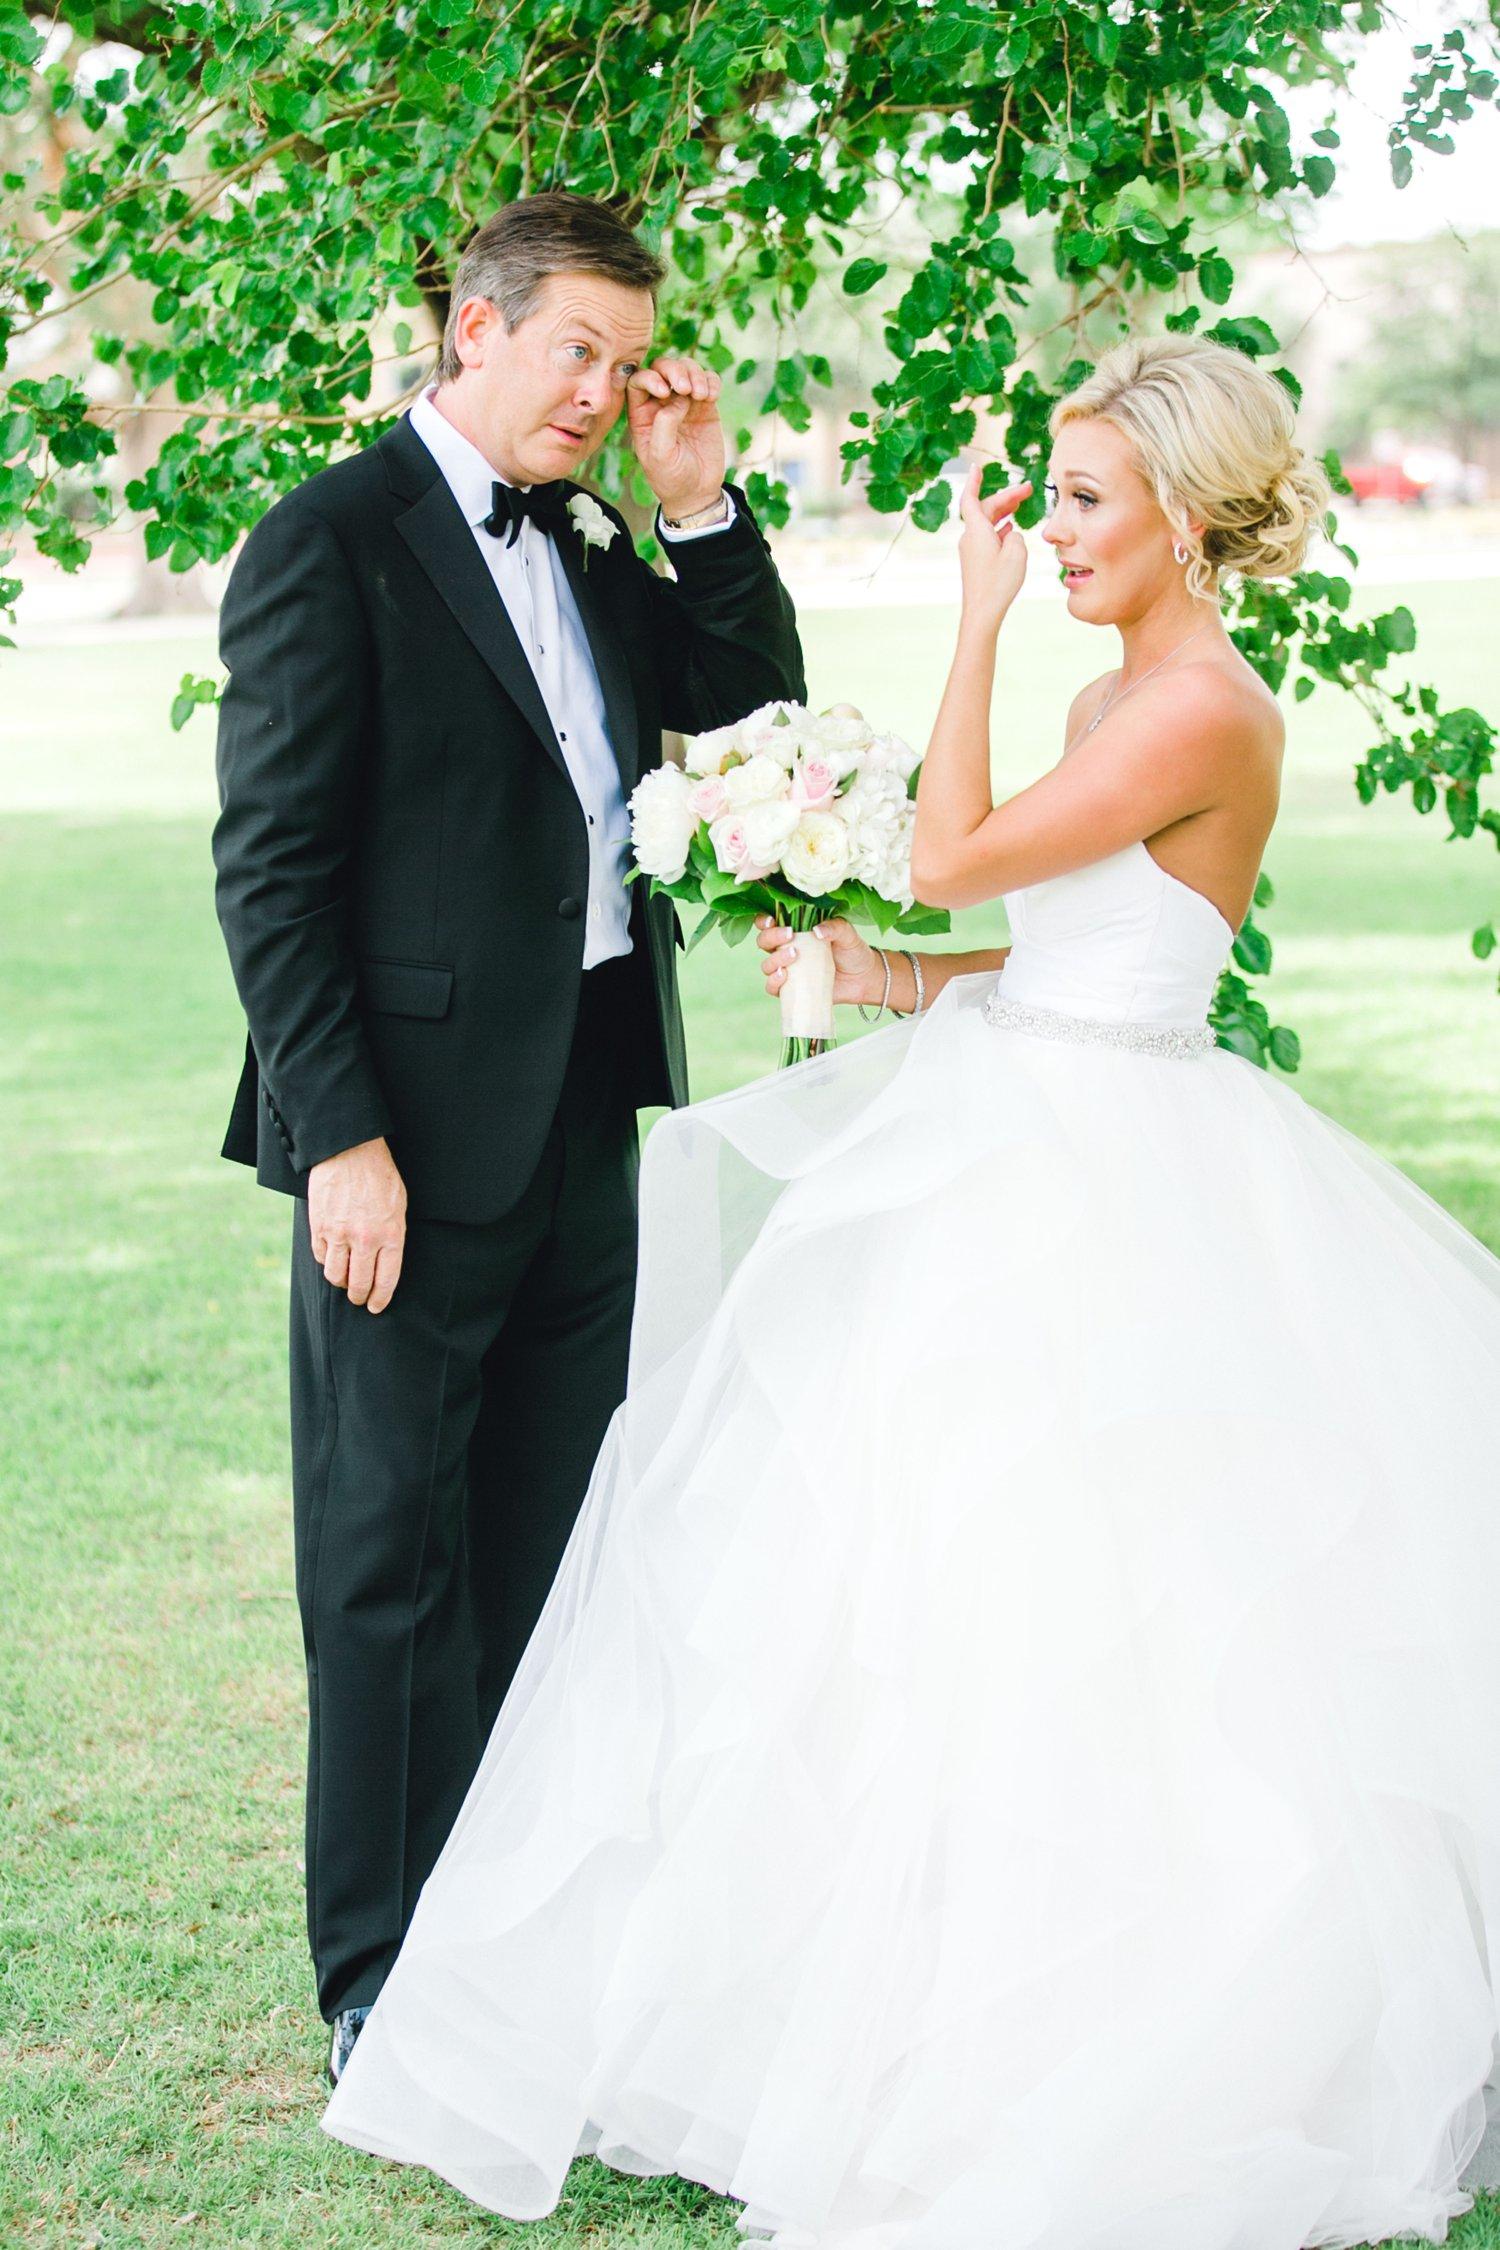 Taylor-and-Brock-Williams-Texas-Tech-University-Merket-Alumni-Center-Lubbock-Photographer-ALLEEJ0017.jpg